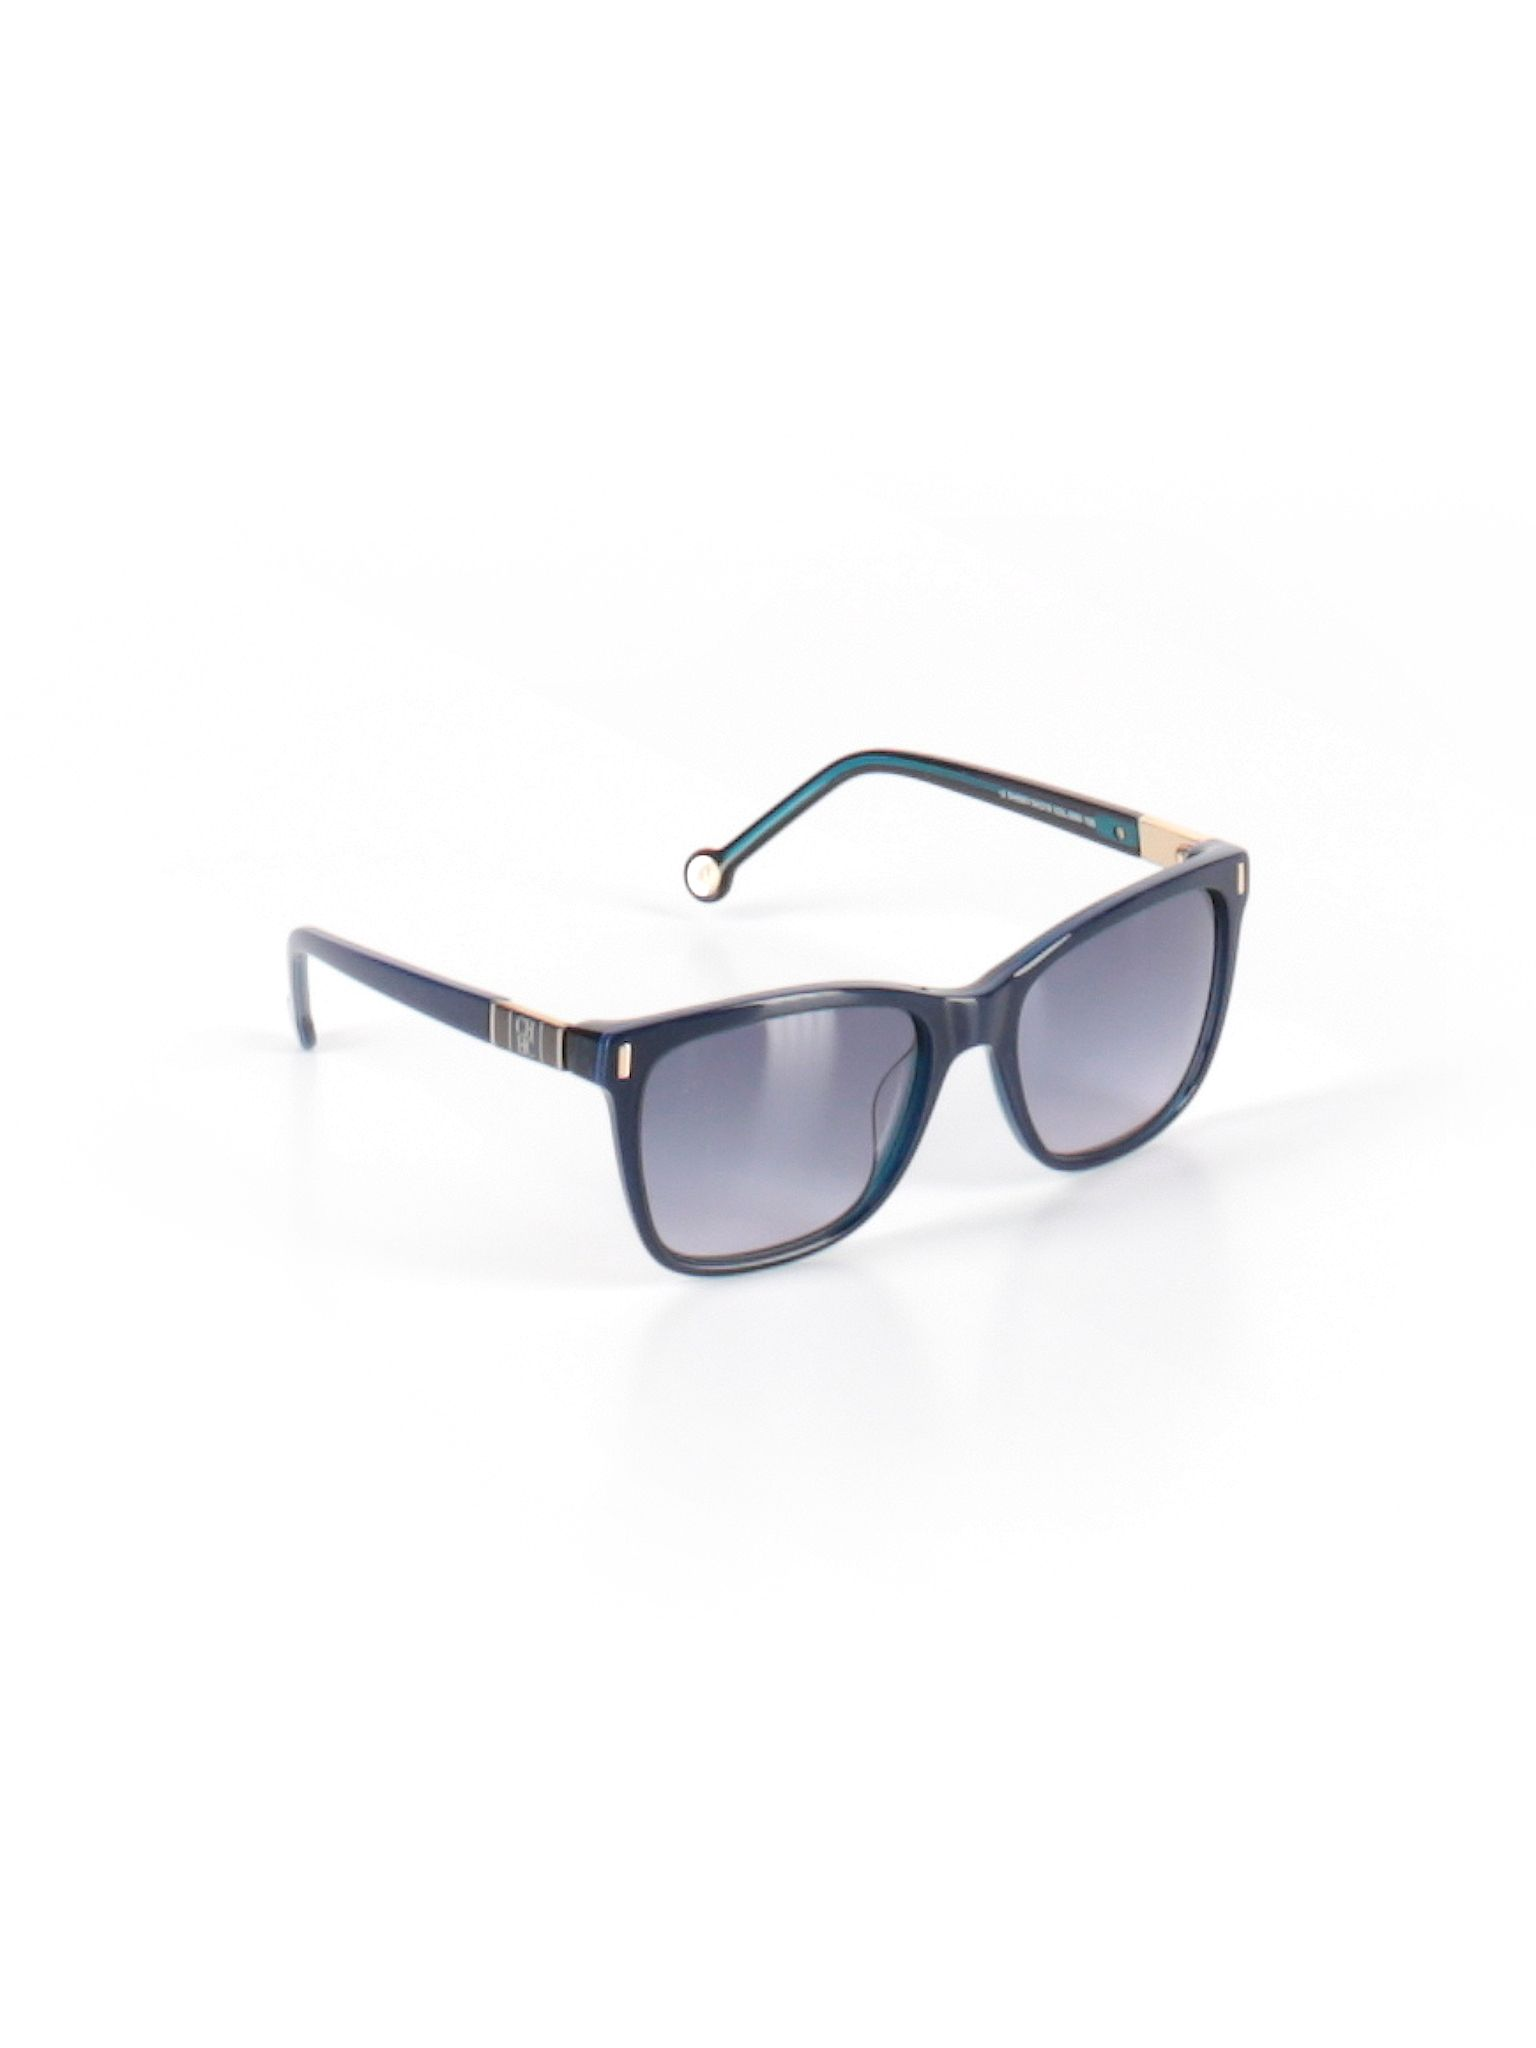 400d1c40915b CH Carolina Herrera Sunglasses  Dark Blue Women s Accessories - 30140130